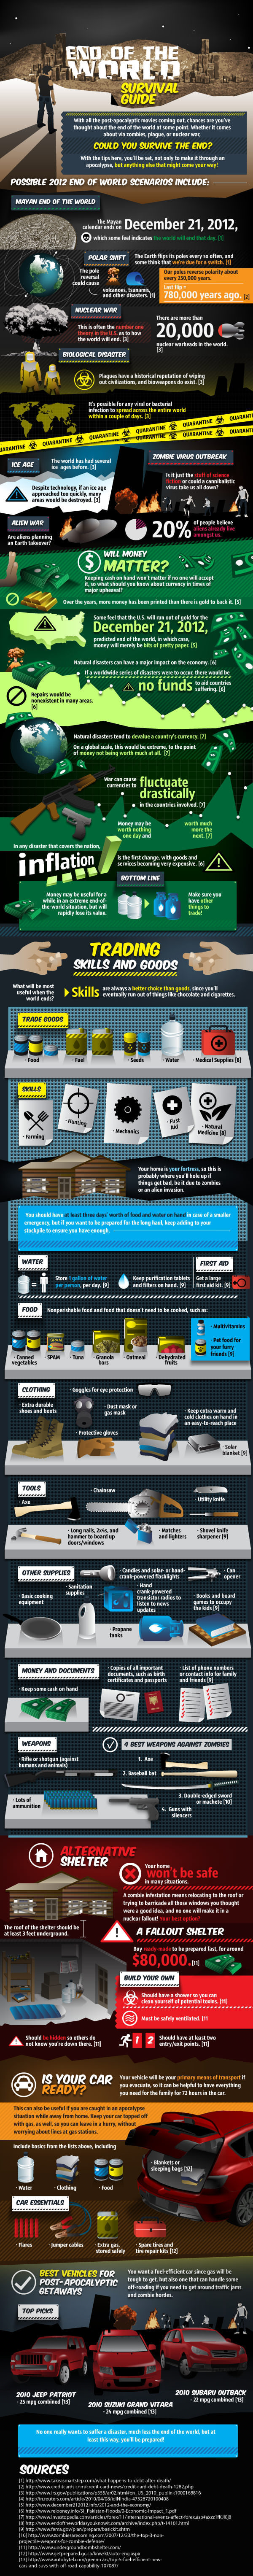 Infografía fin del mundo 2012